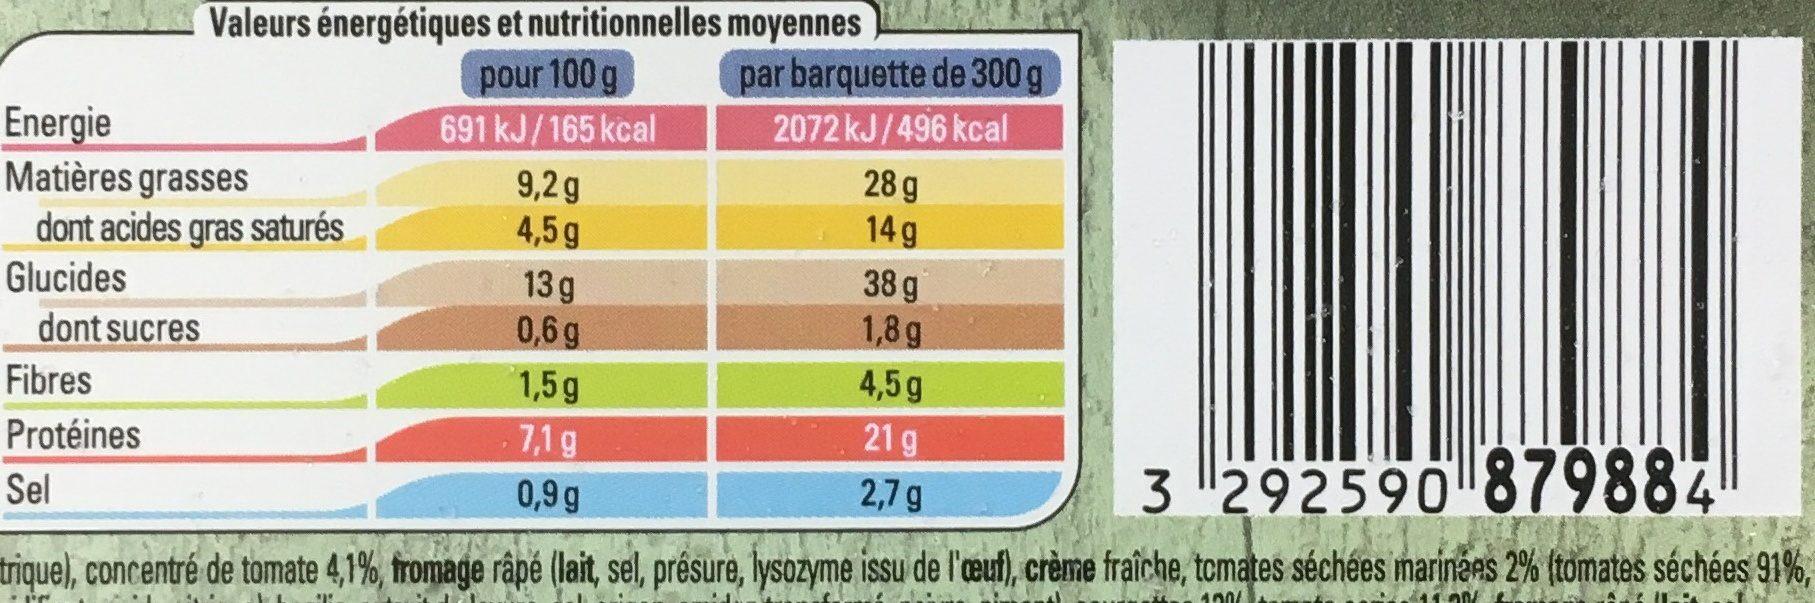 Ravioli ricotta tomates marinées sauce pesto rosso - Informations nutritionnelles